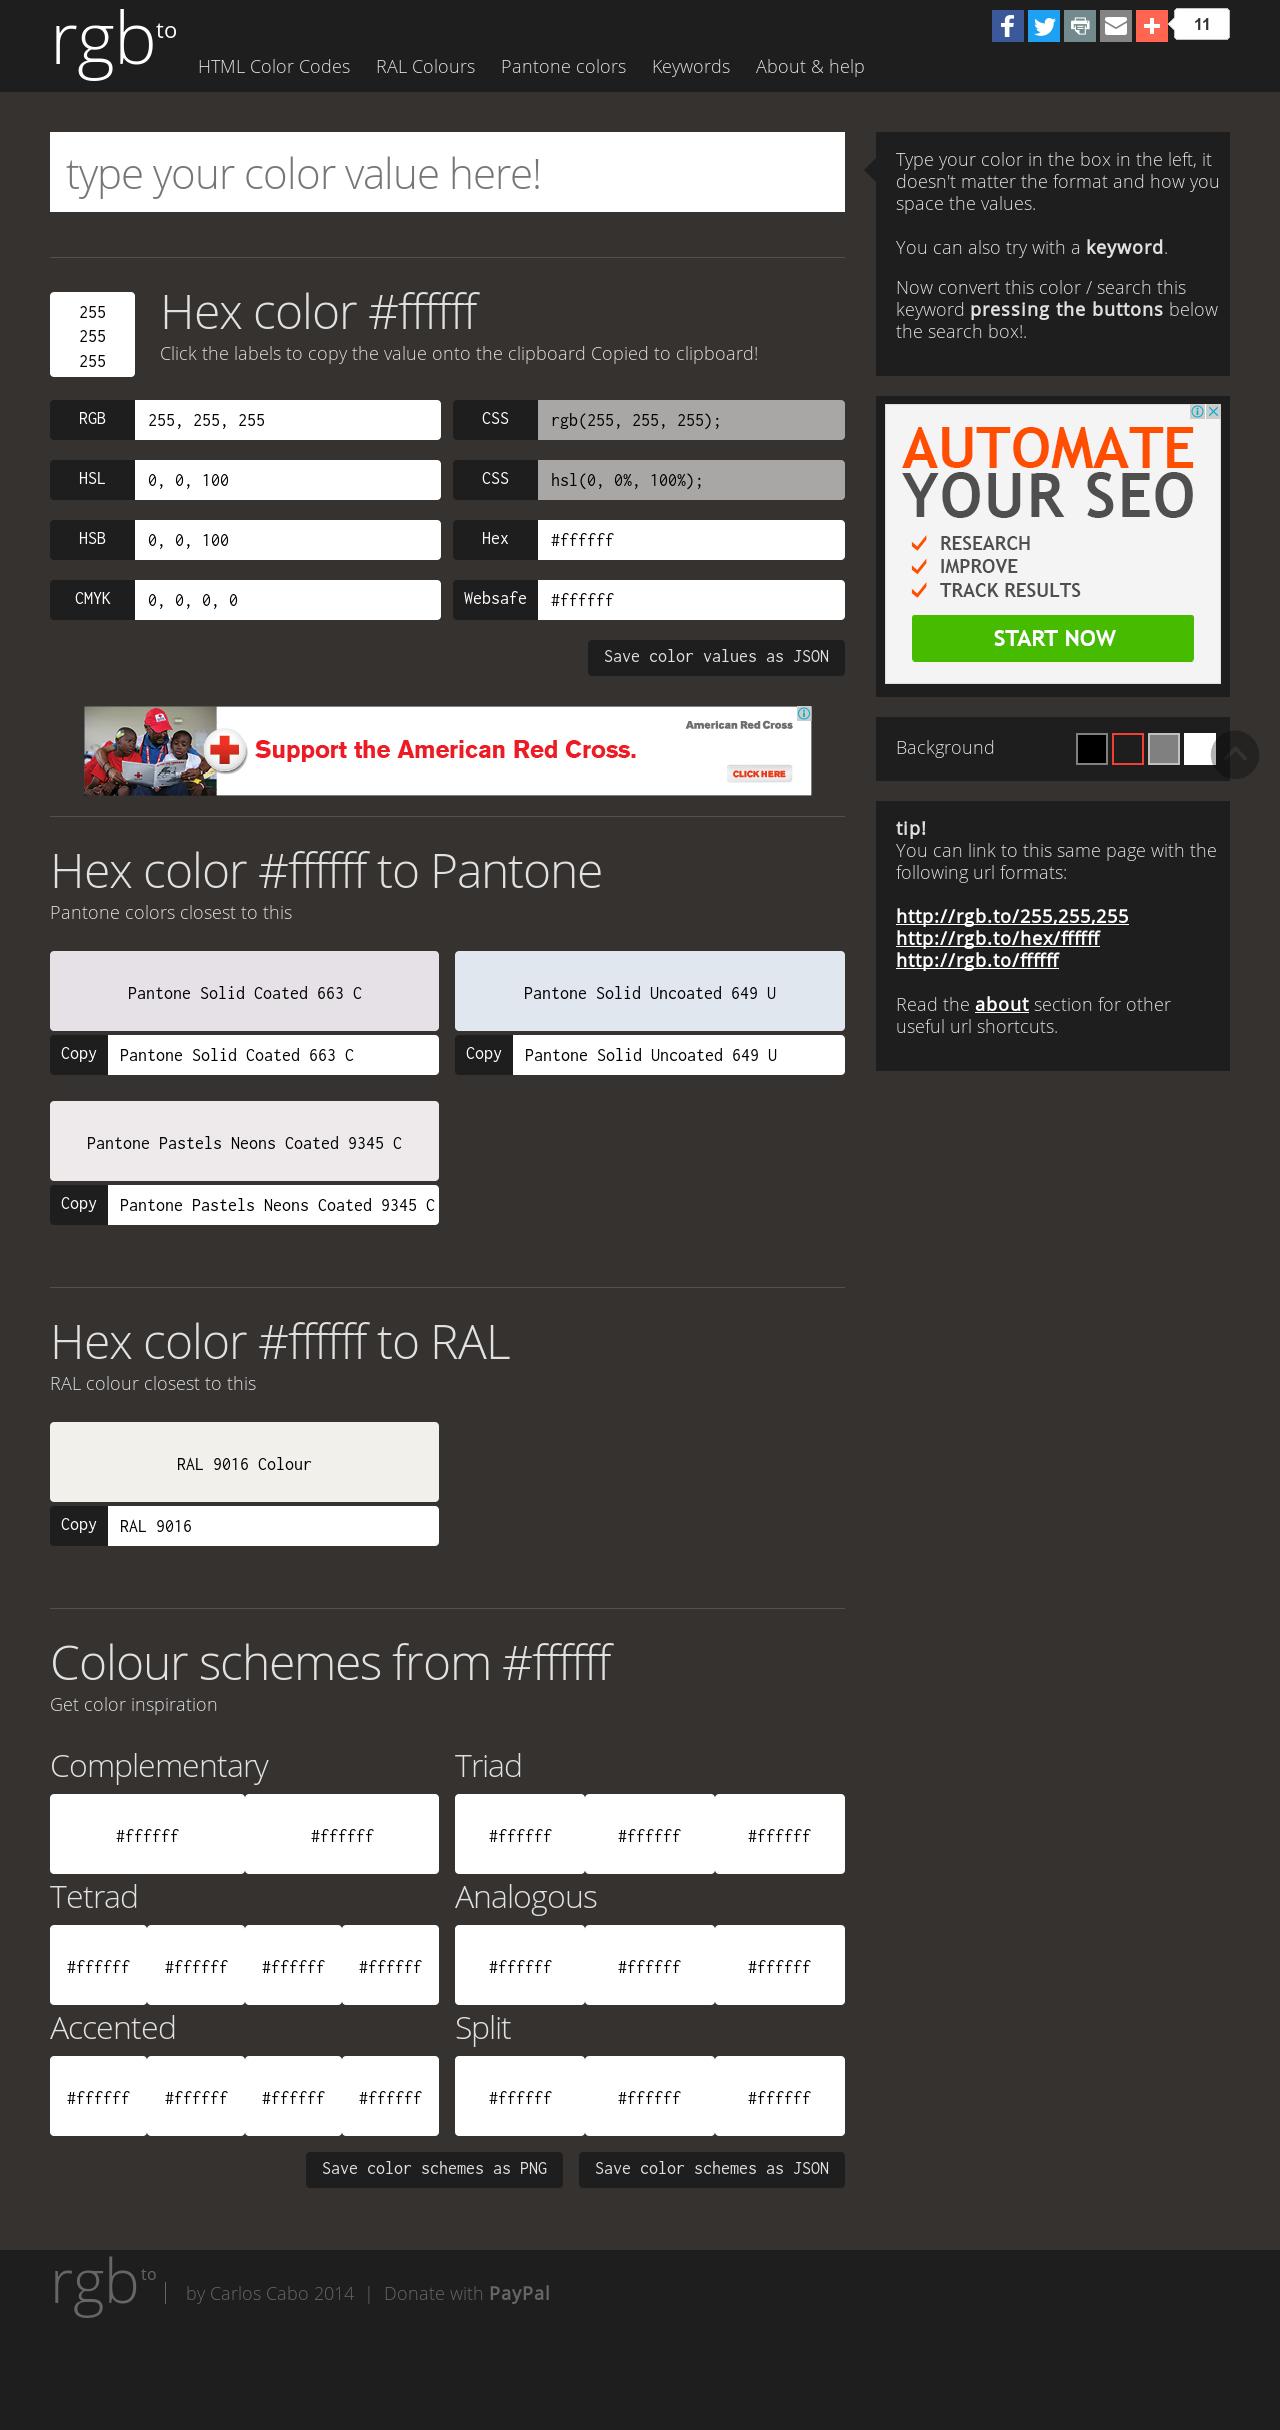 Ral Pantone hex color ffffff to rgb pantone ral hsl hsb json get color